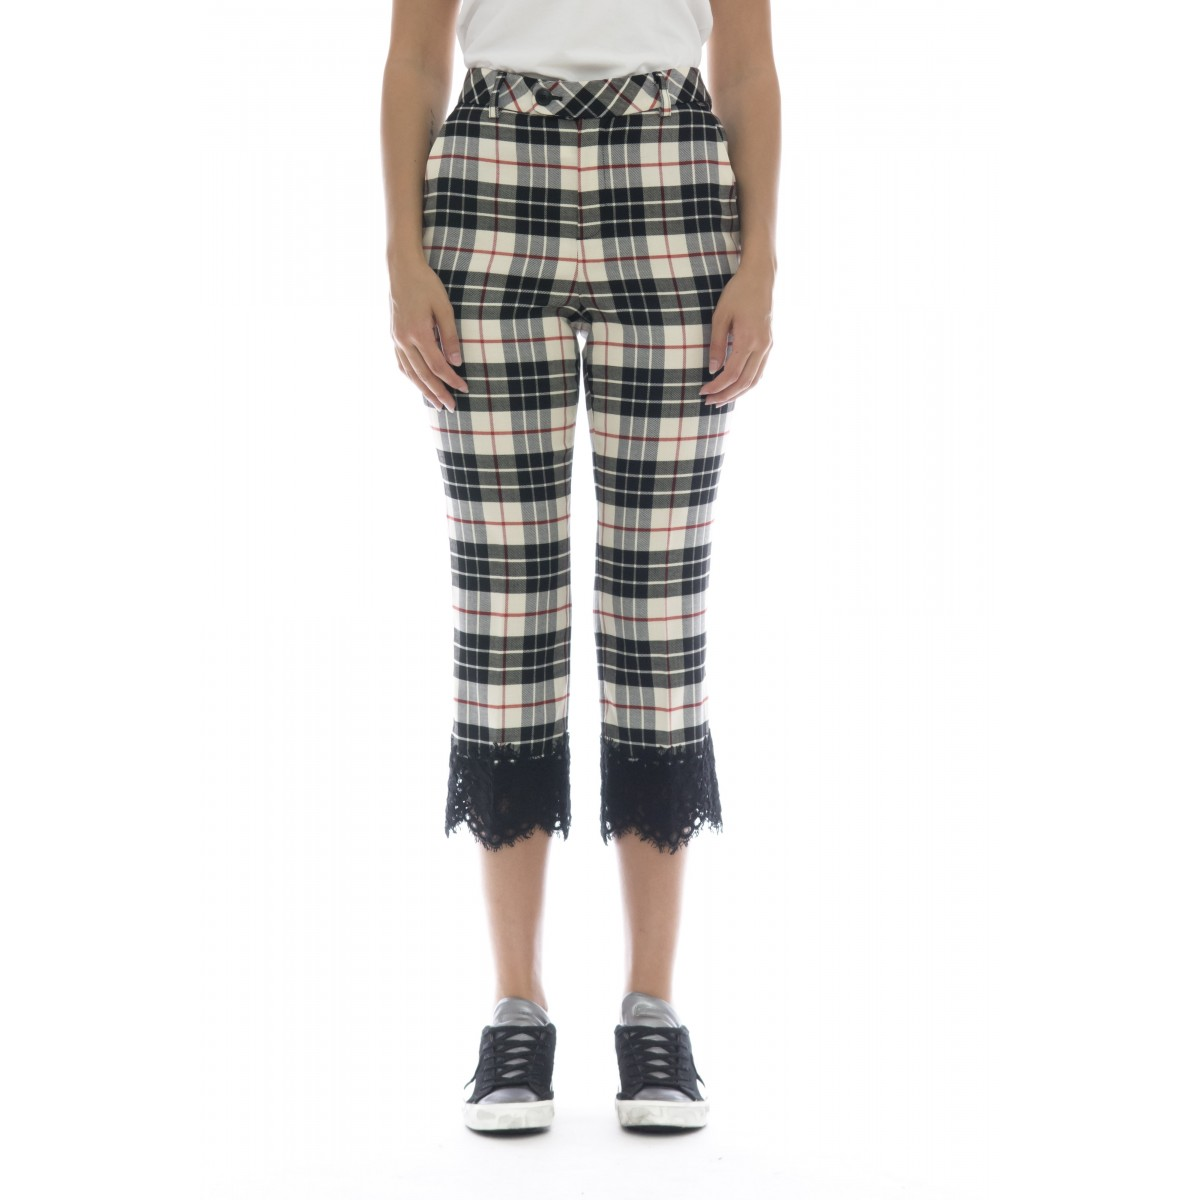 Pantalone donna - 2622 pantalone tartan + pizzo